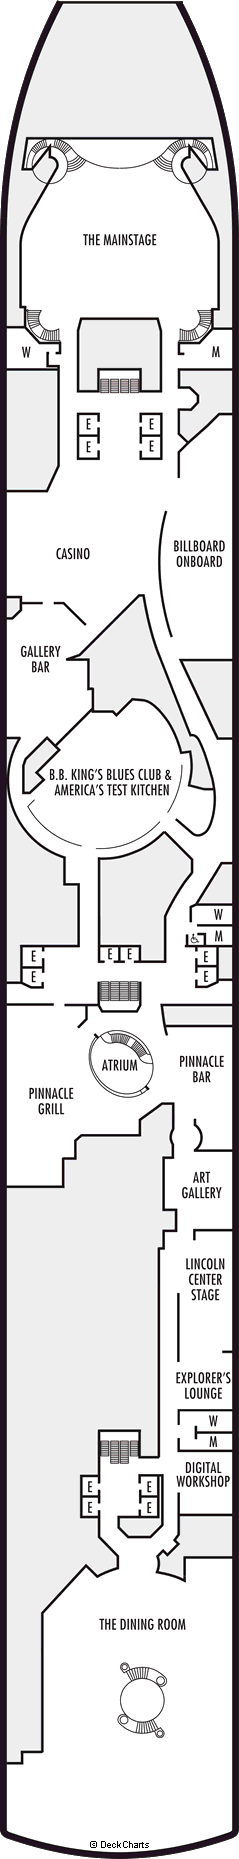 Eurodam: Lower Promenade Deck